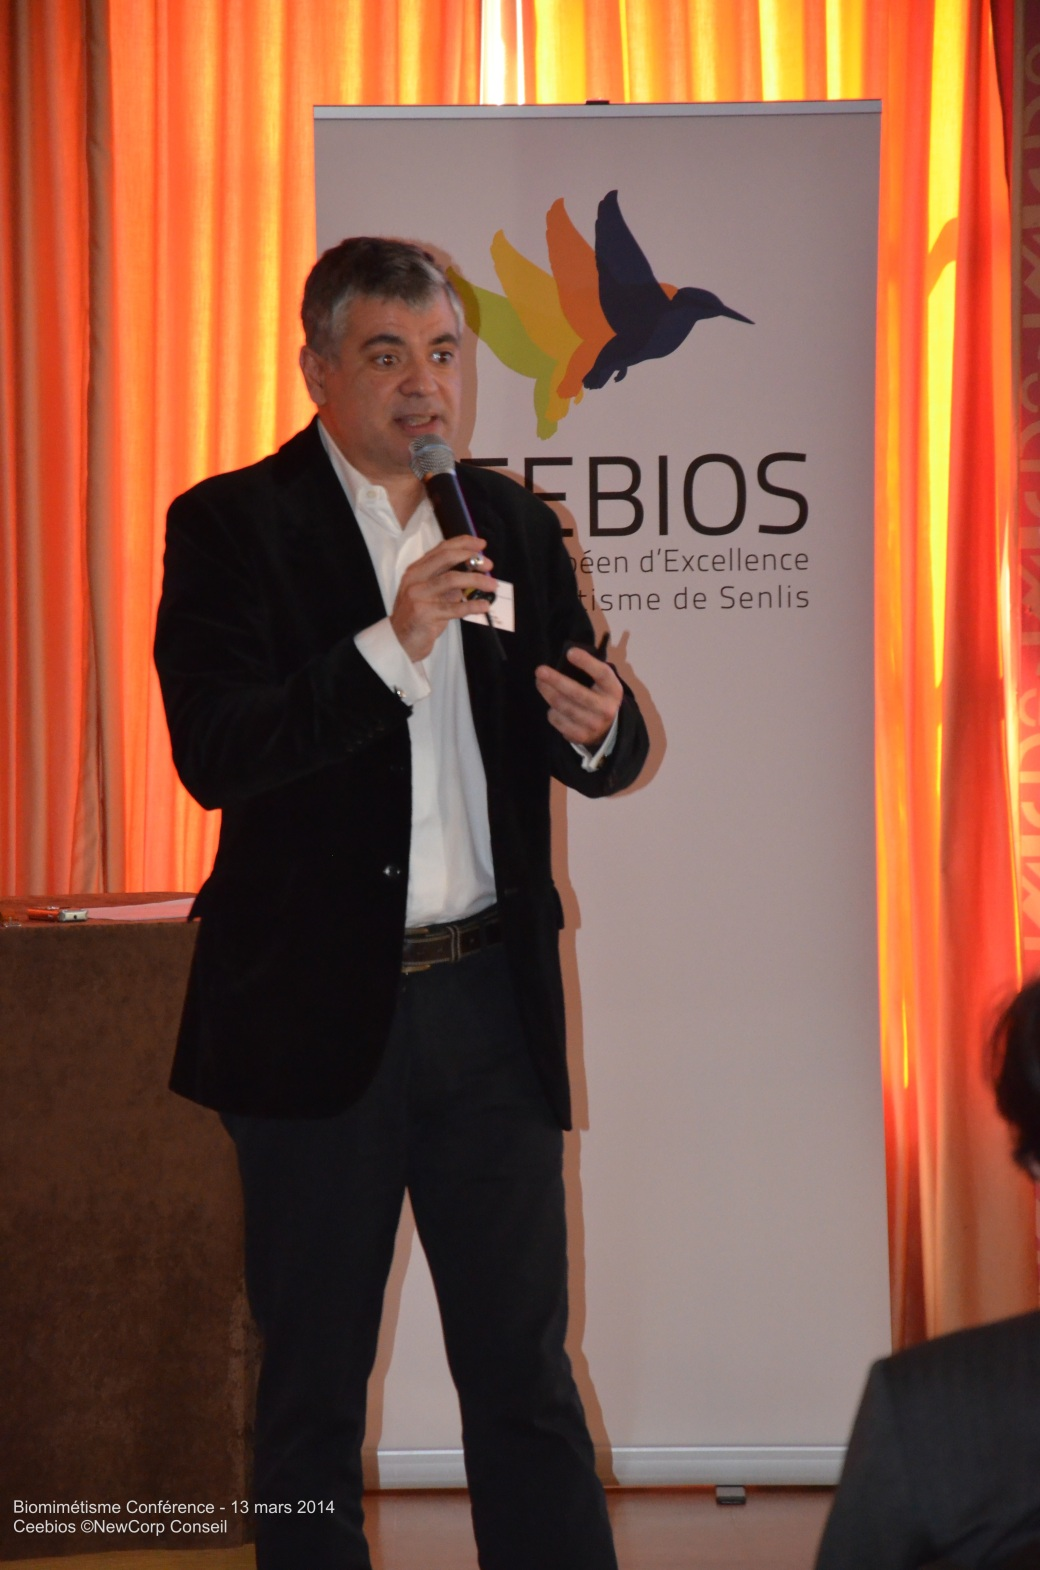 biomimetisme conference 9